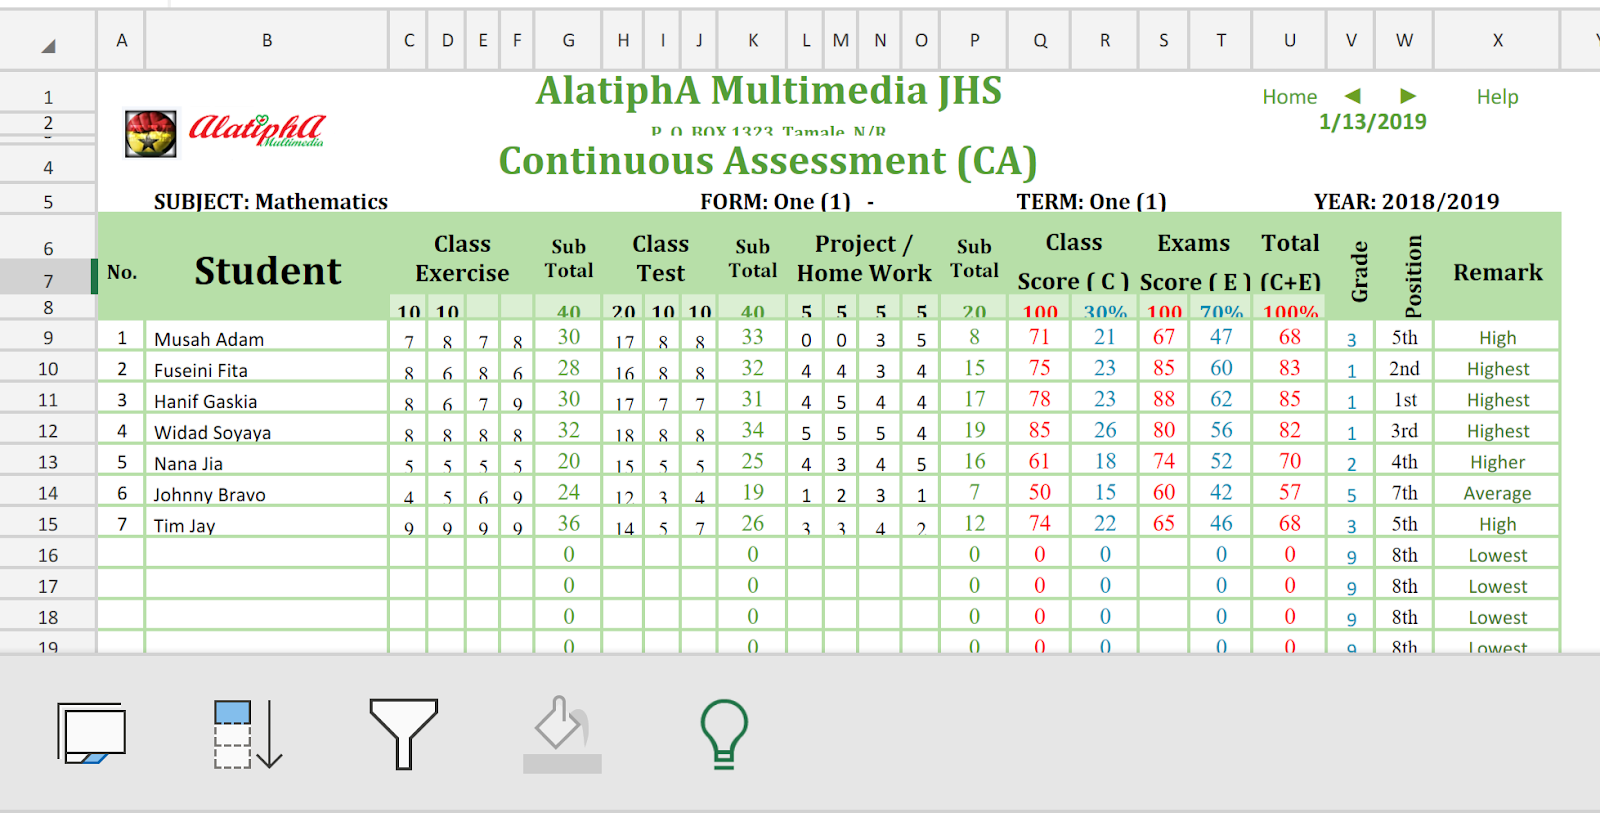 Alatipha Multimedia Awake Ghana Youth Ca Gradebook For